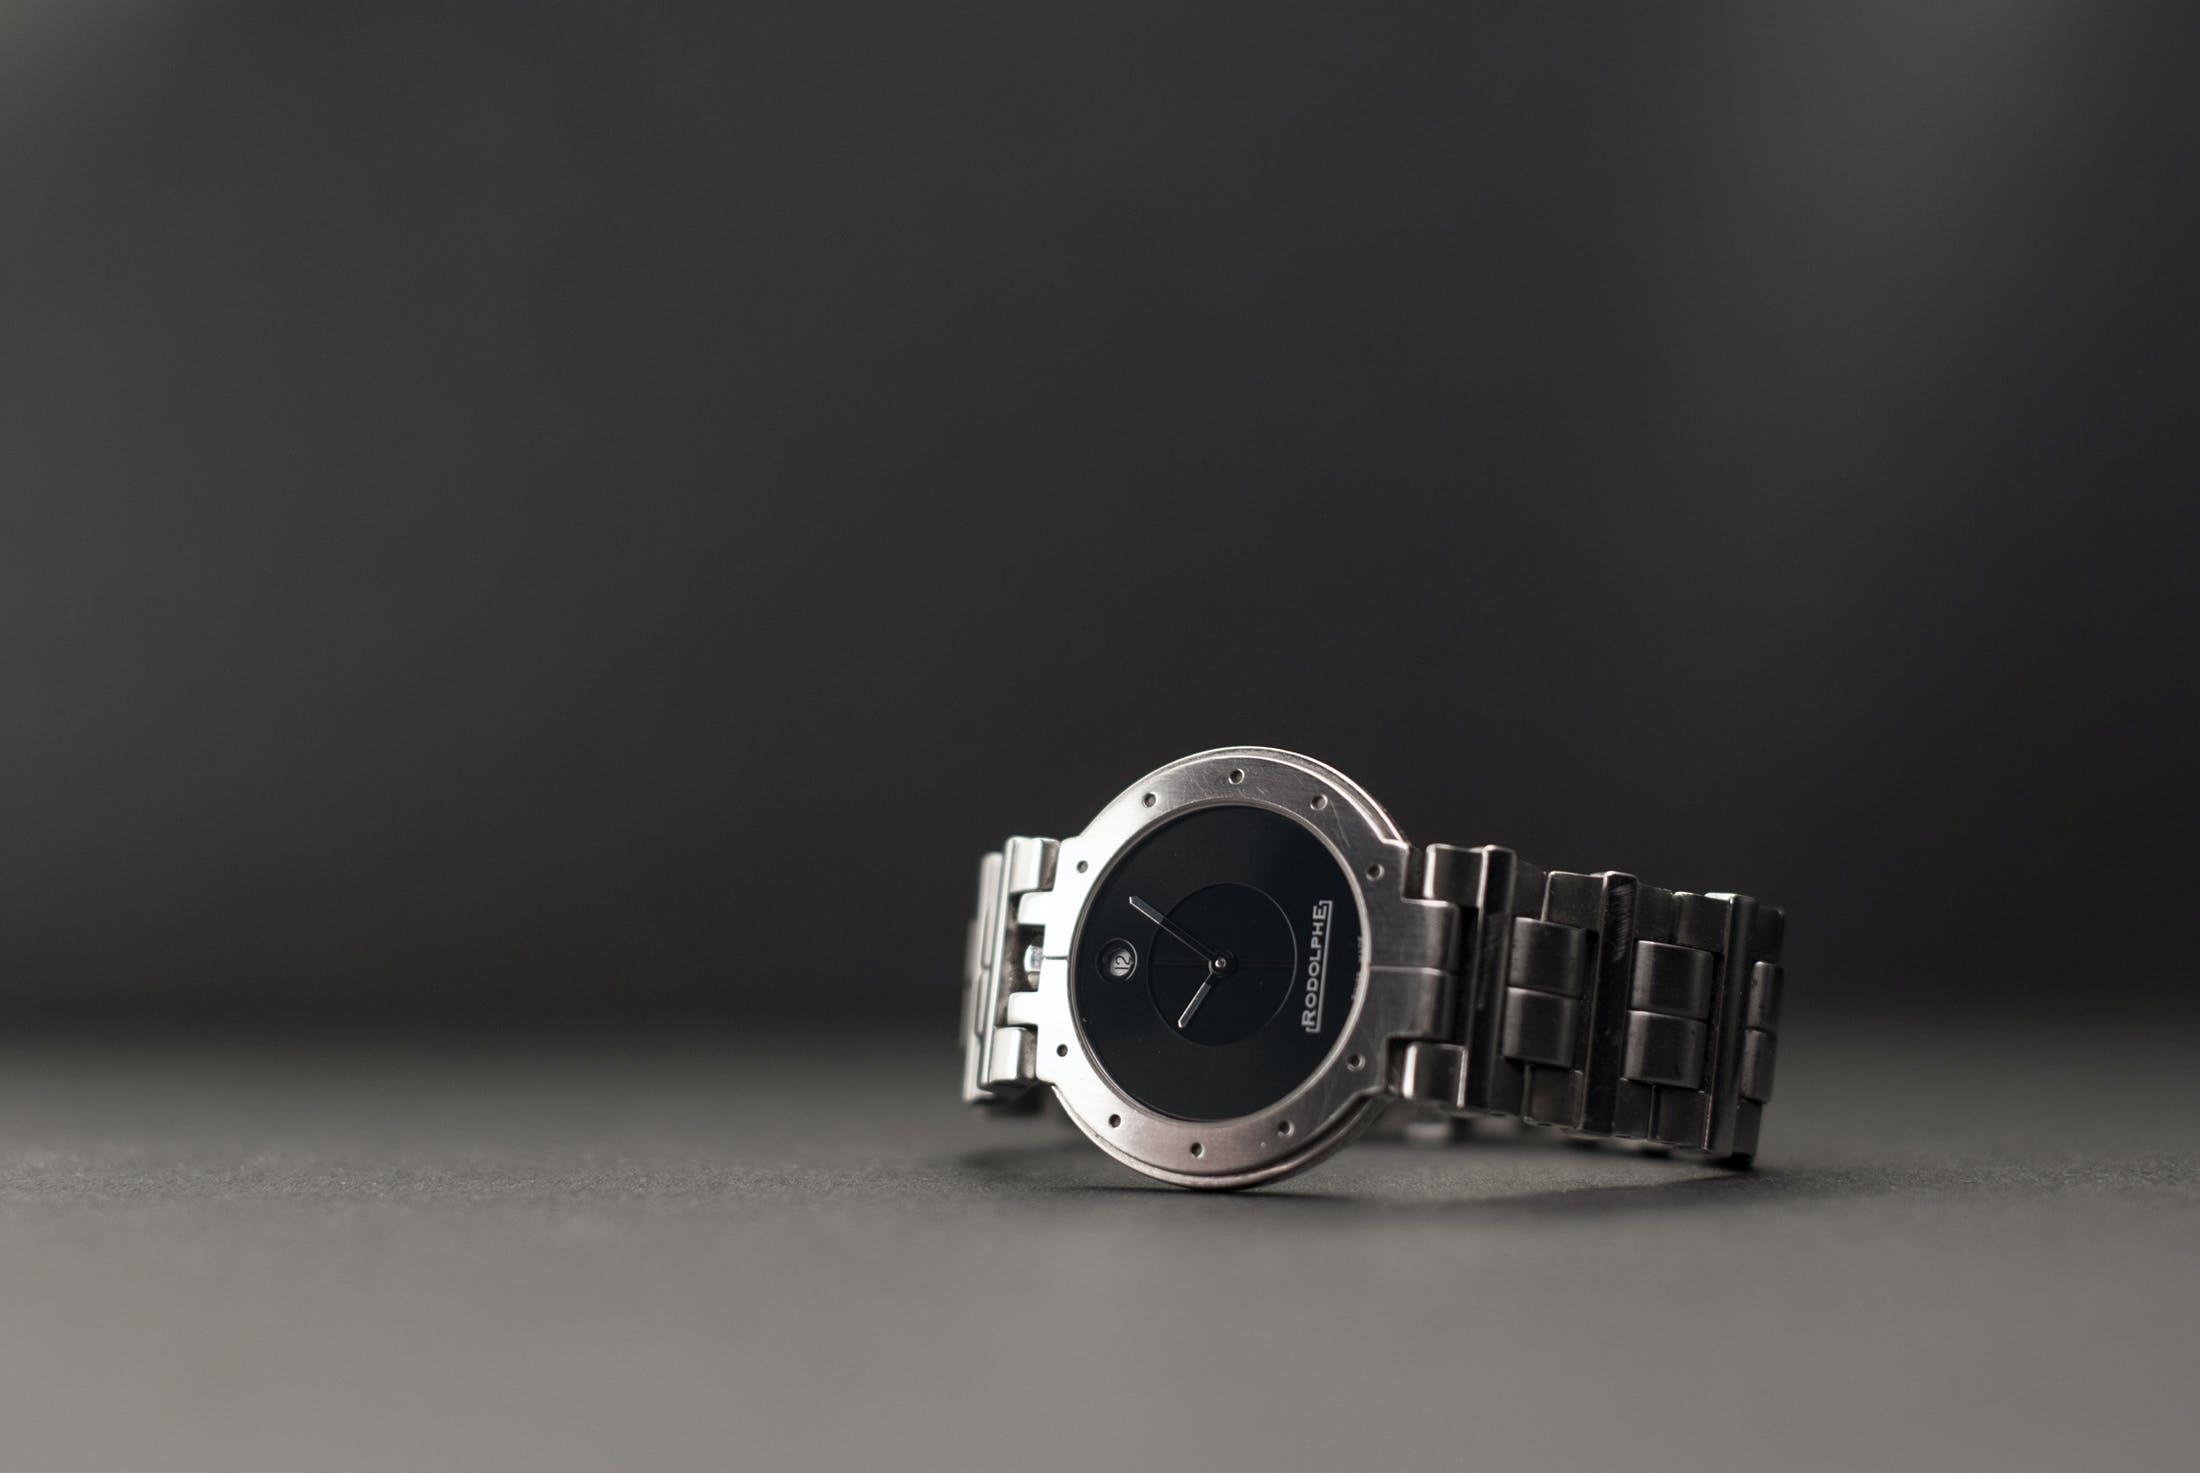 Silver Link Round Black Analog Watch